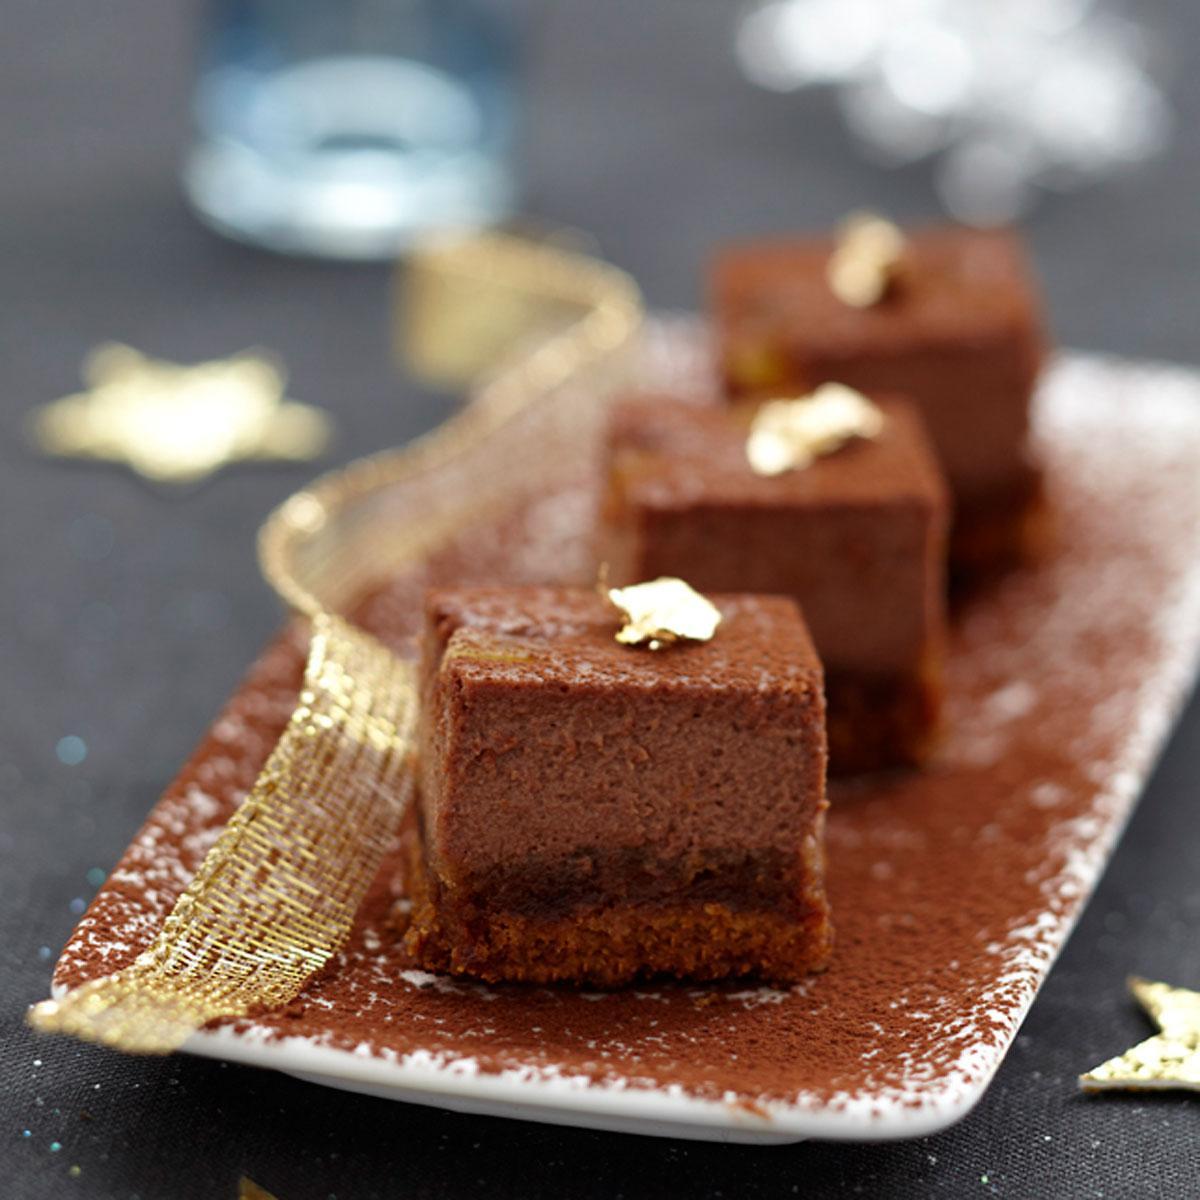 no l dix recettes de desserts au chocolat le figaro madame. Black Bedroom Furniture Sets. Home Design Ideas